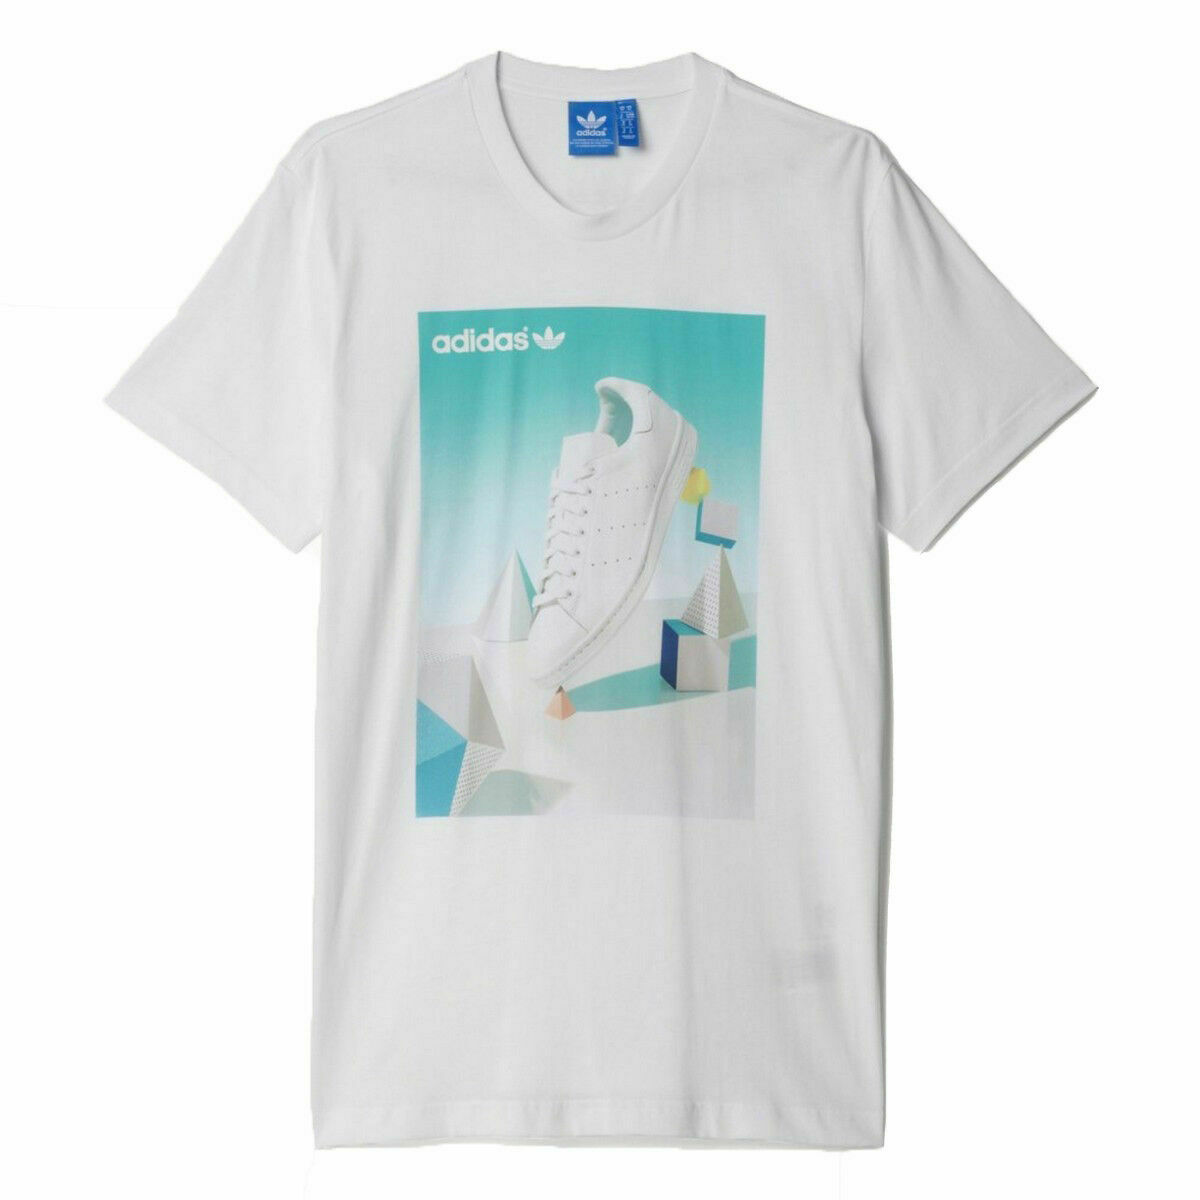 T shirt Adidas Stan Smith Adidas Originals Trefoil, Adidas T